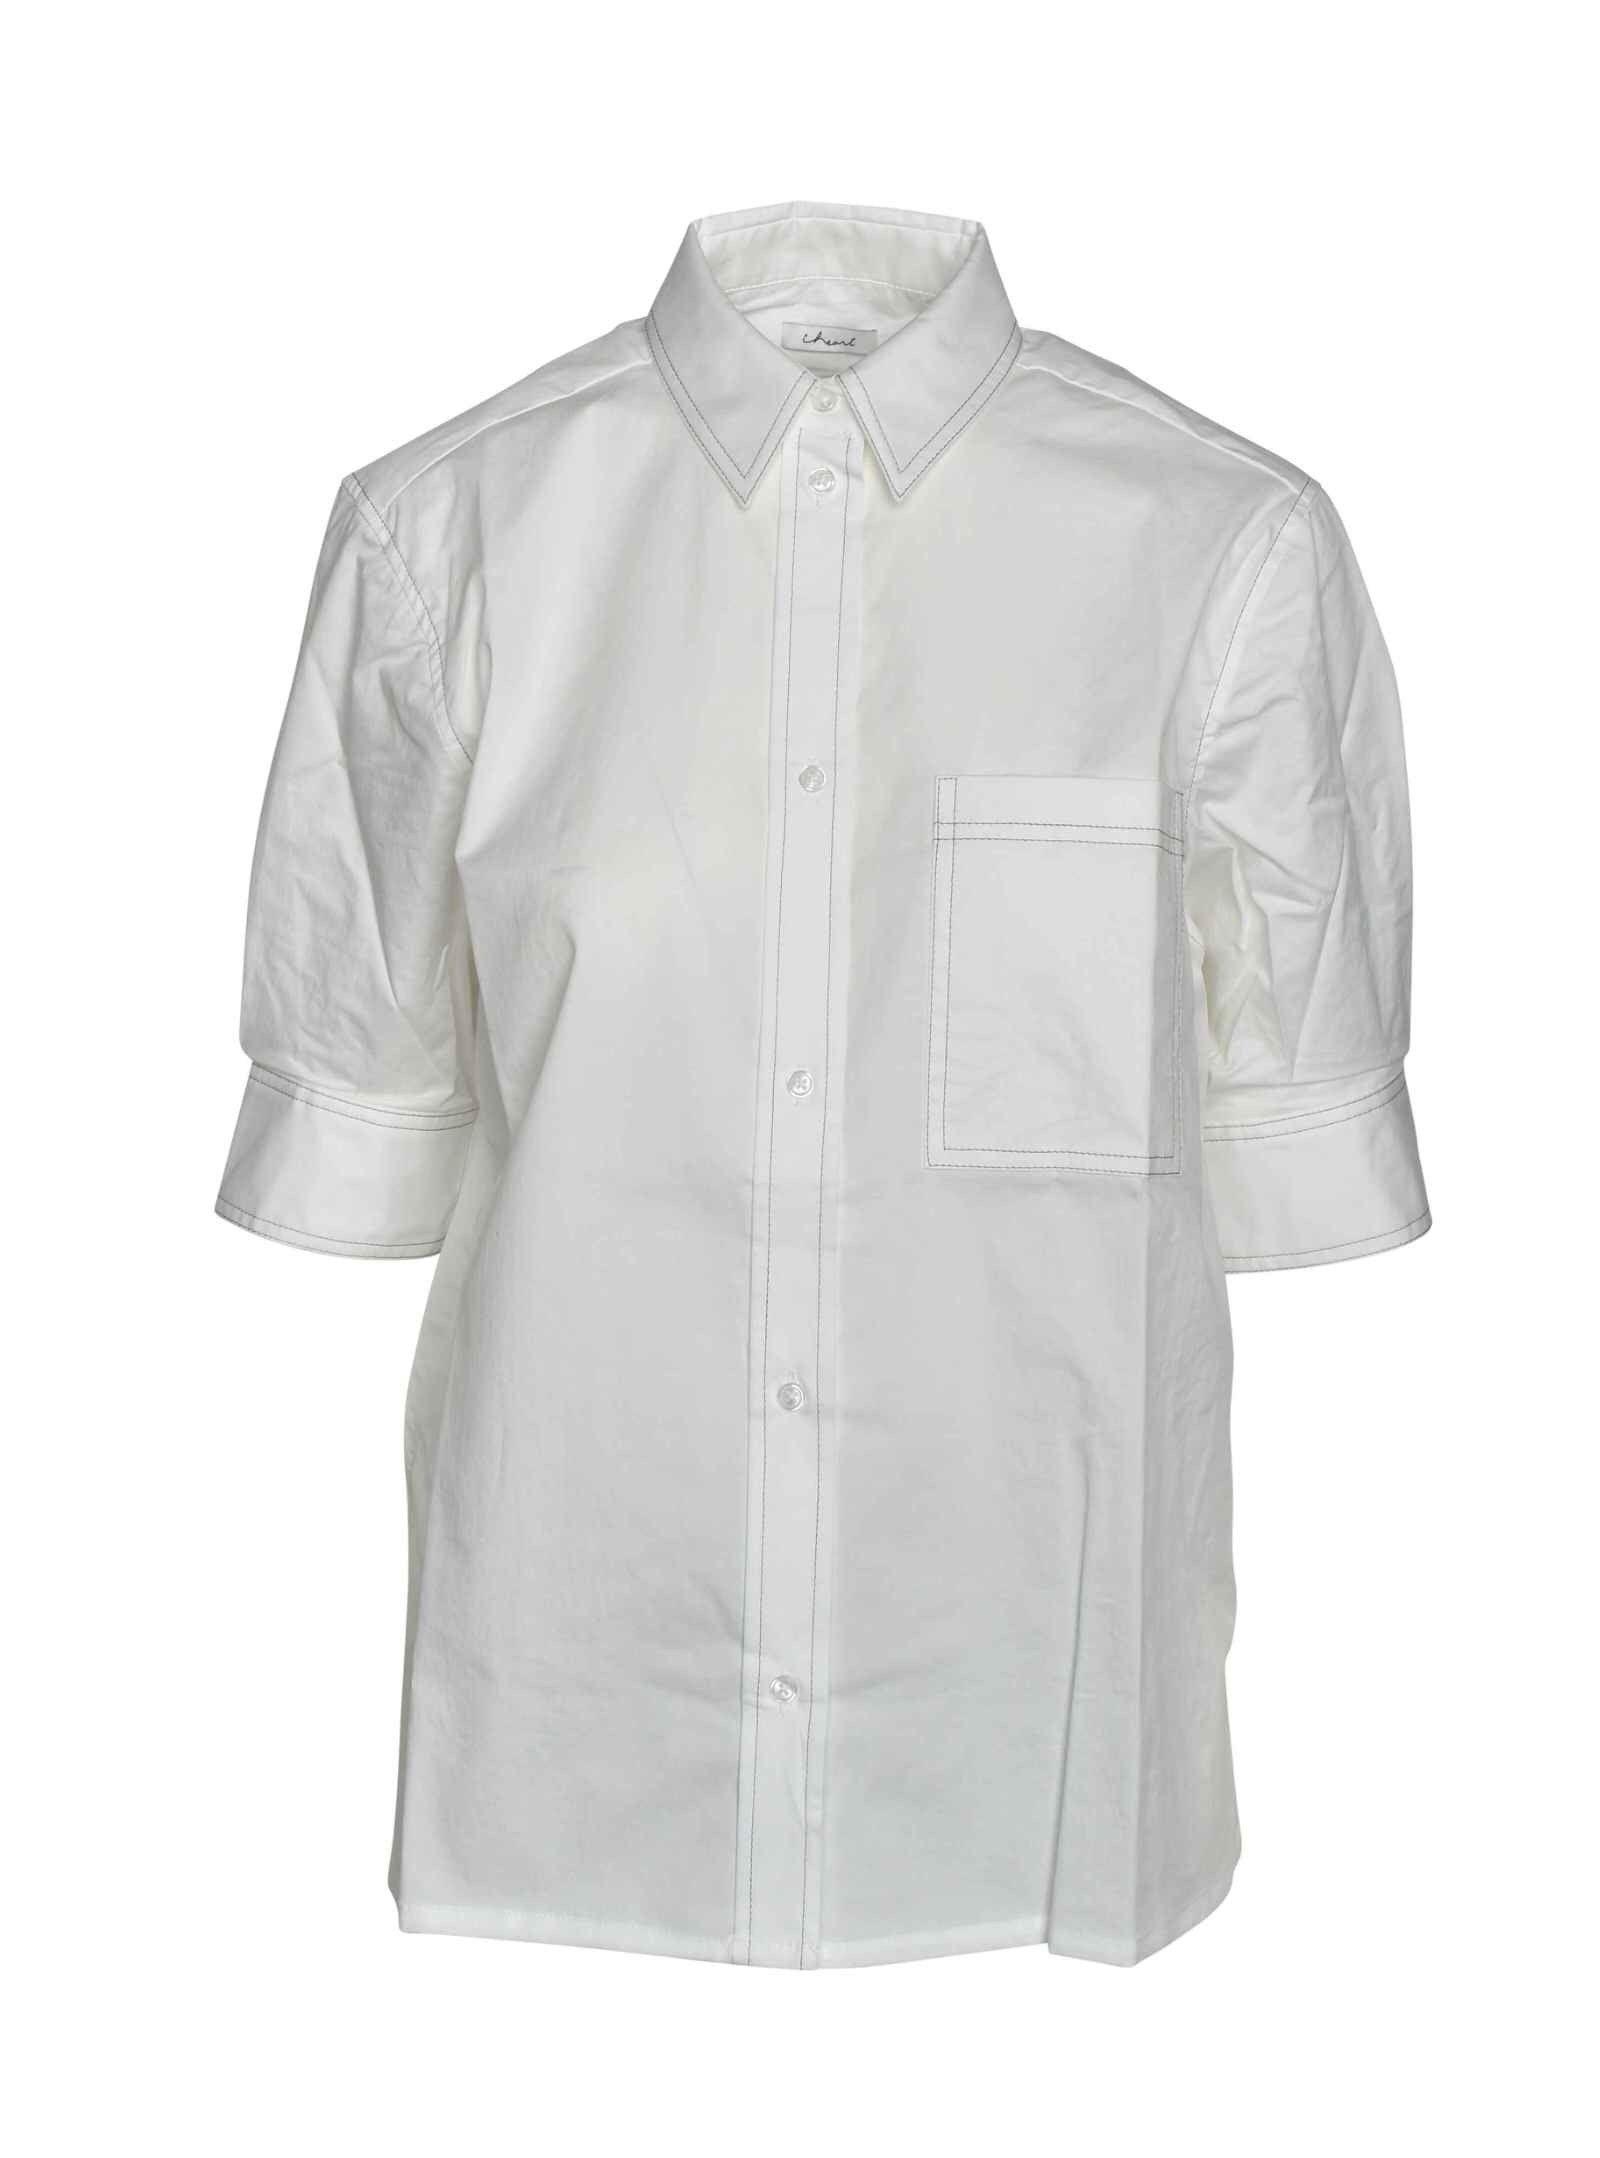 iHEART - Damen Bluse - Fola-White